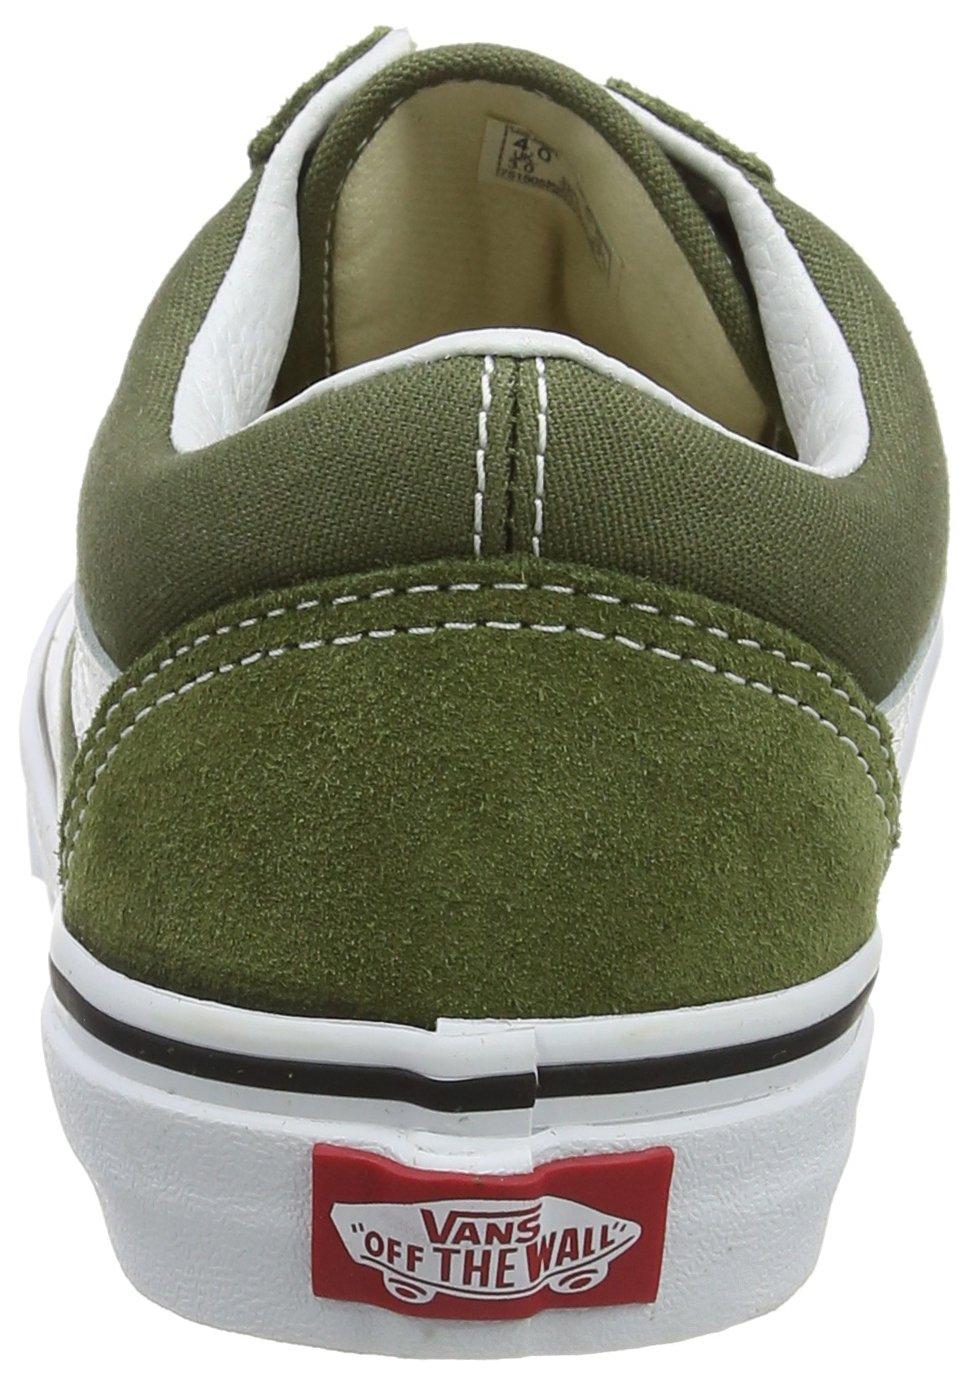 4394be361e ... Vans Unisex Unisex Unisex Old Skool Classic Skate Shoes B01N0P3VCC 9.5  M US Women   8 ...